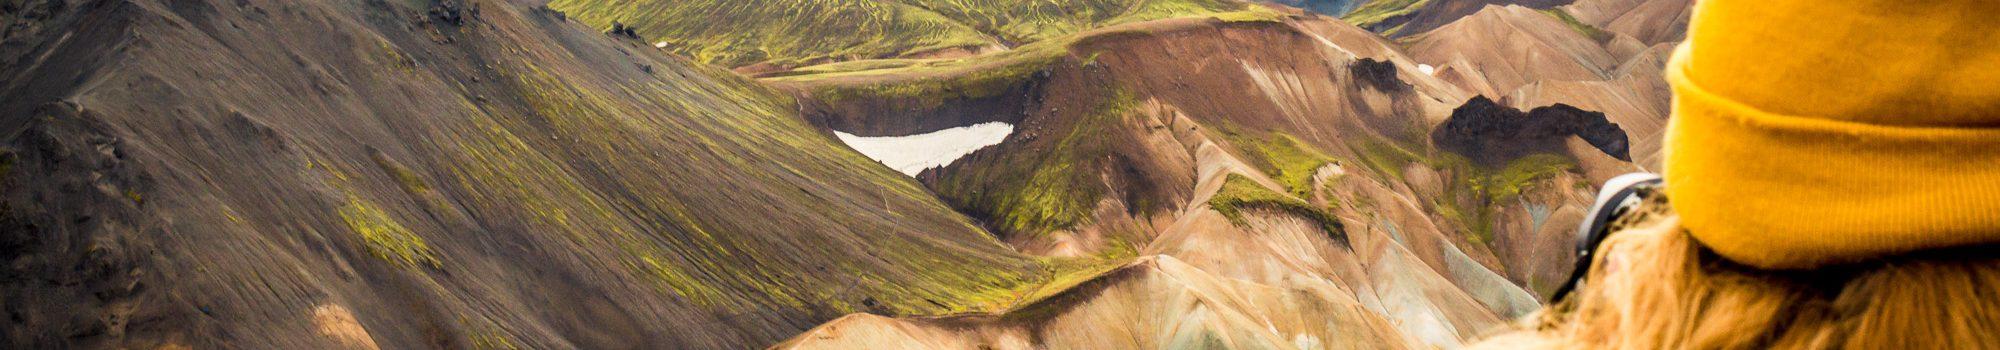 Iceland-Landmannalaugar- Laugavegur-hike-trekking (12)